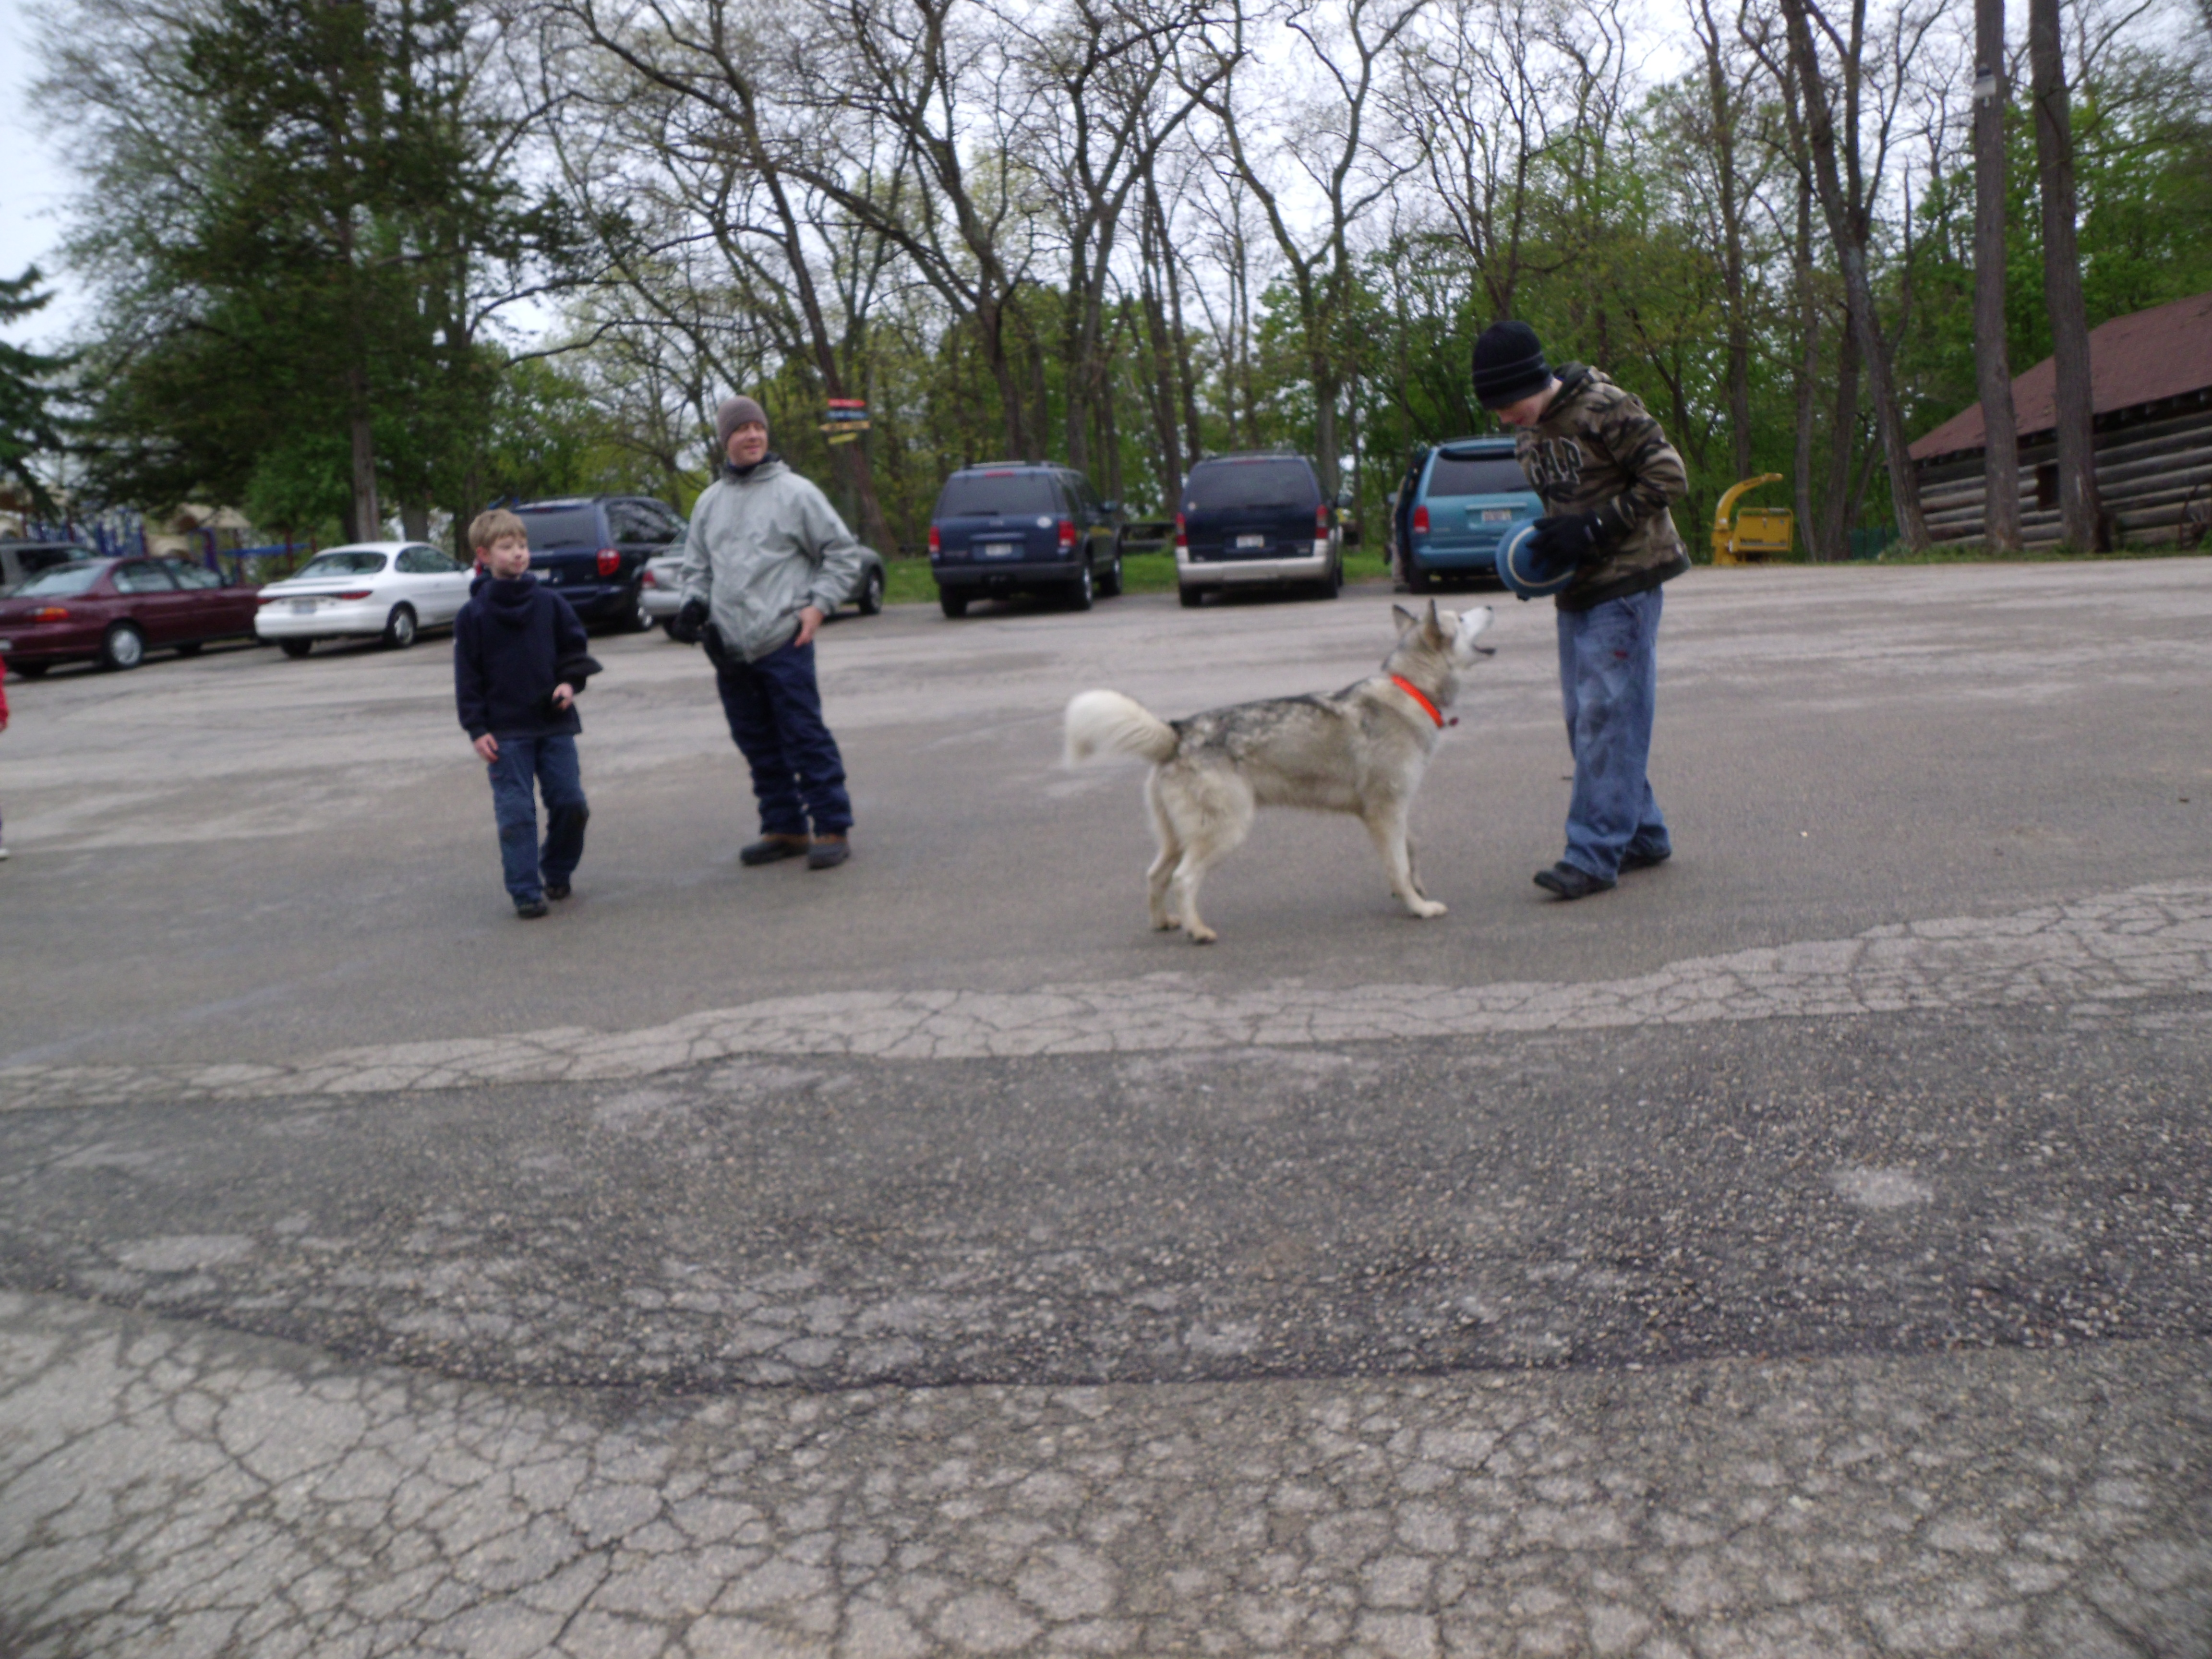 the dog Timber